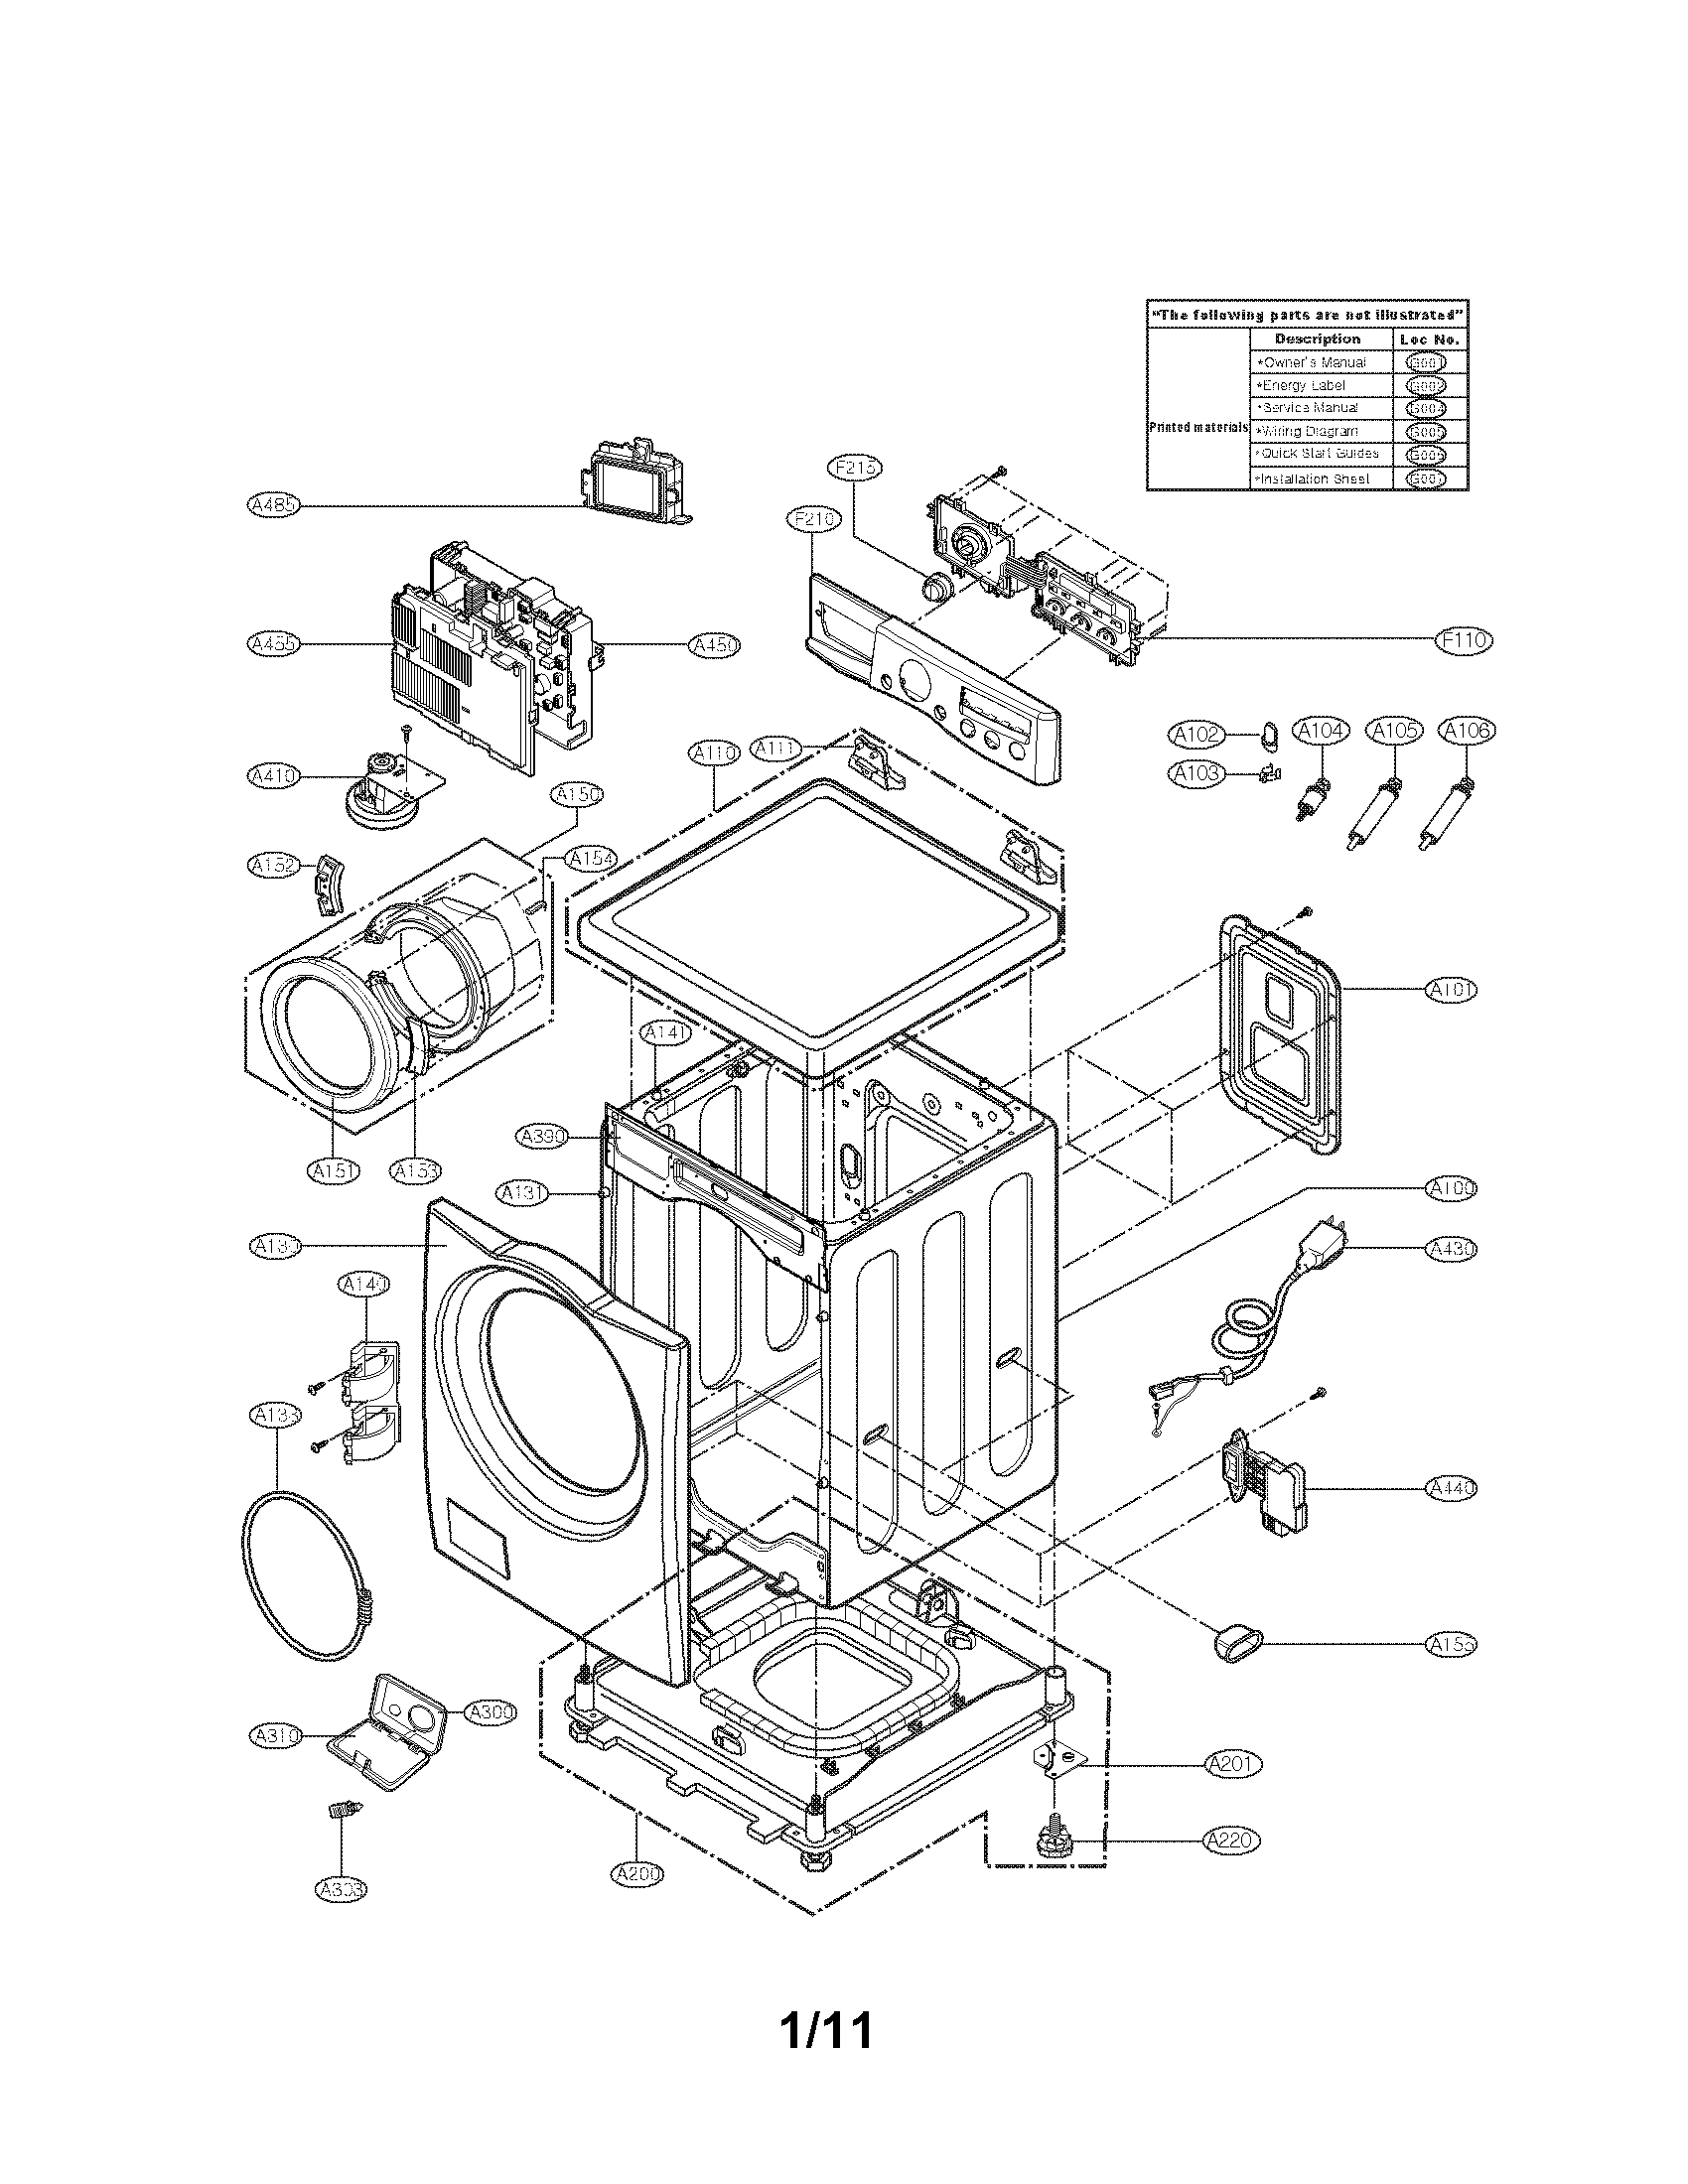 Lg model WM2301HW residential washers genuine parts